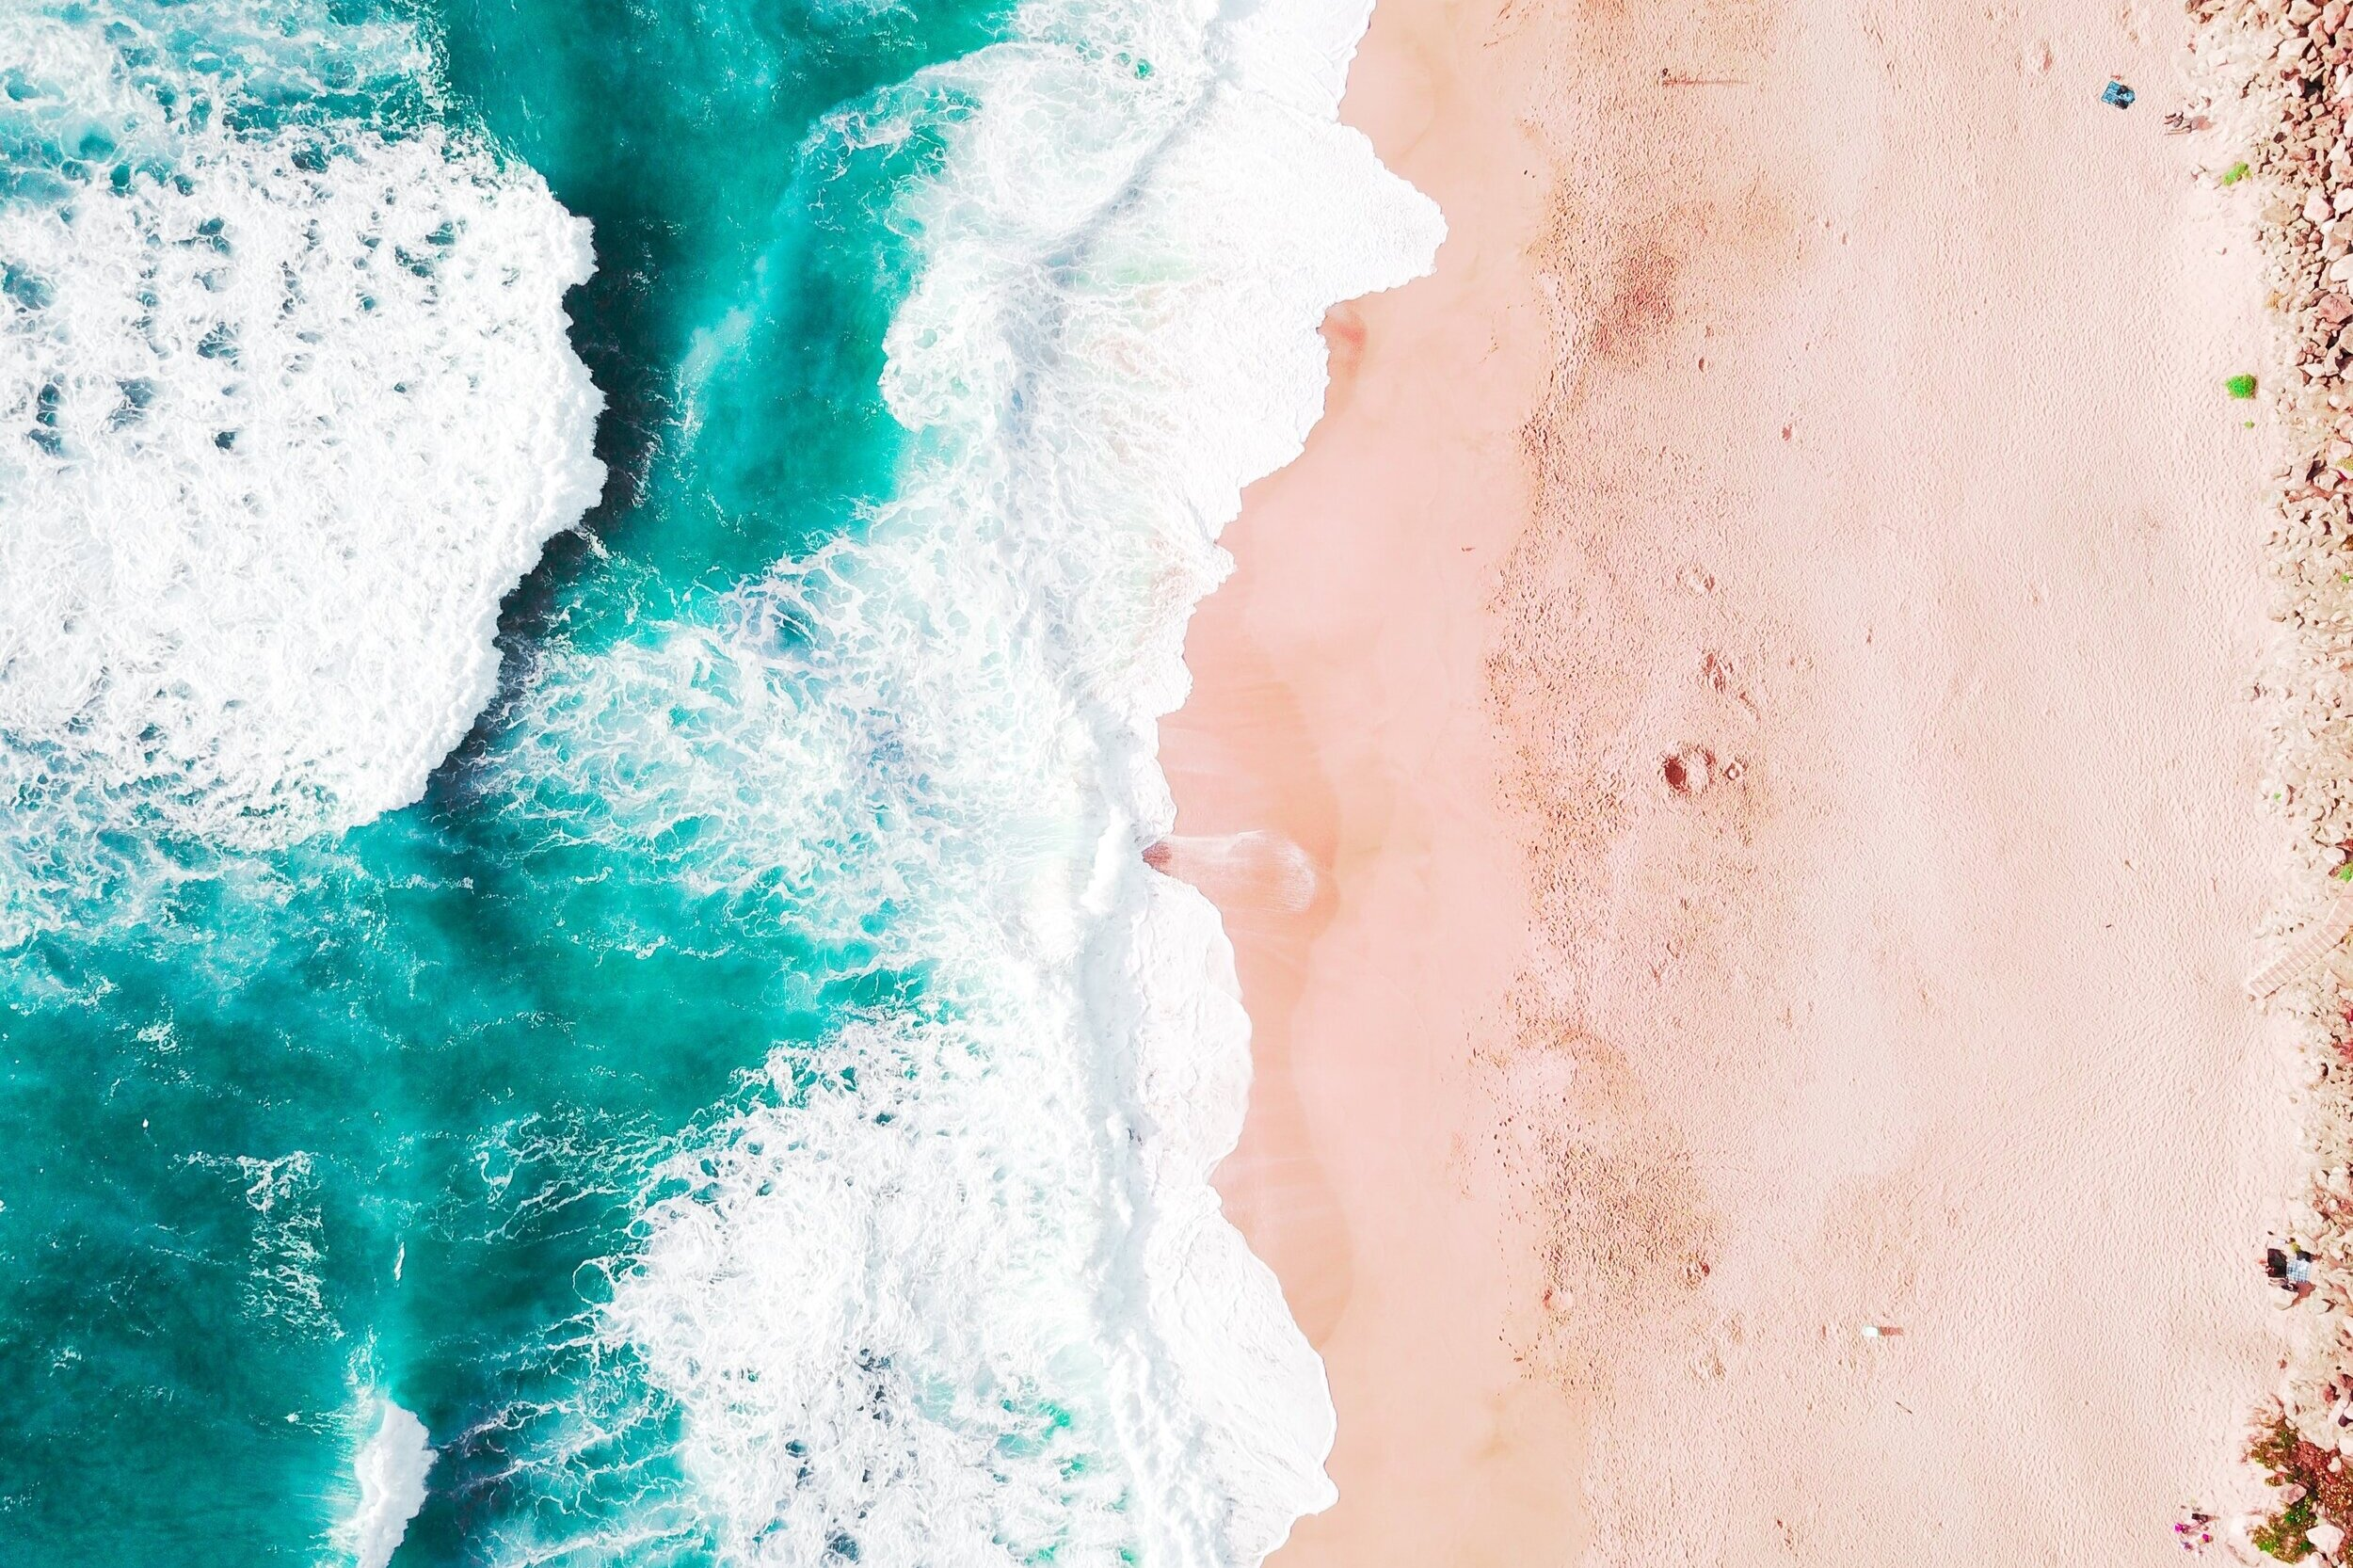 Baja California Sur, Mexico - February 14th - 17th, 2020